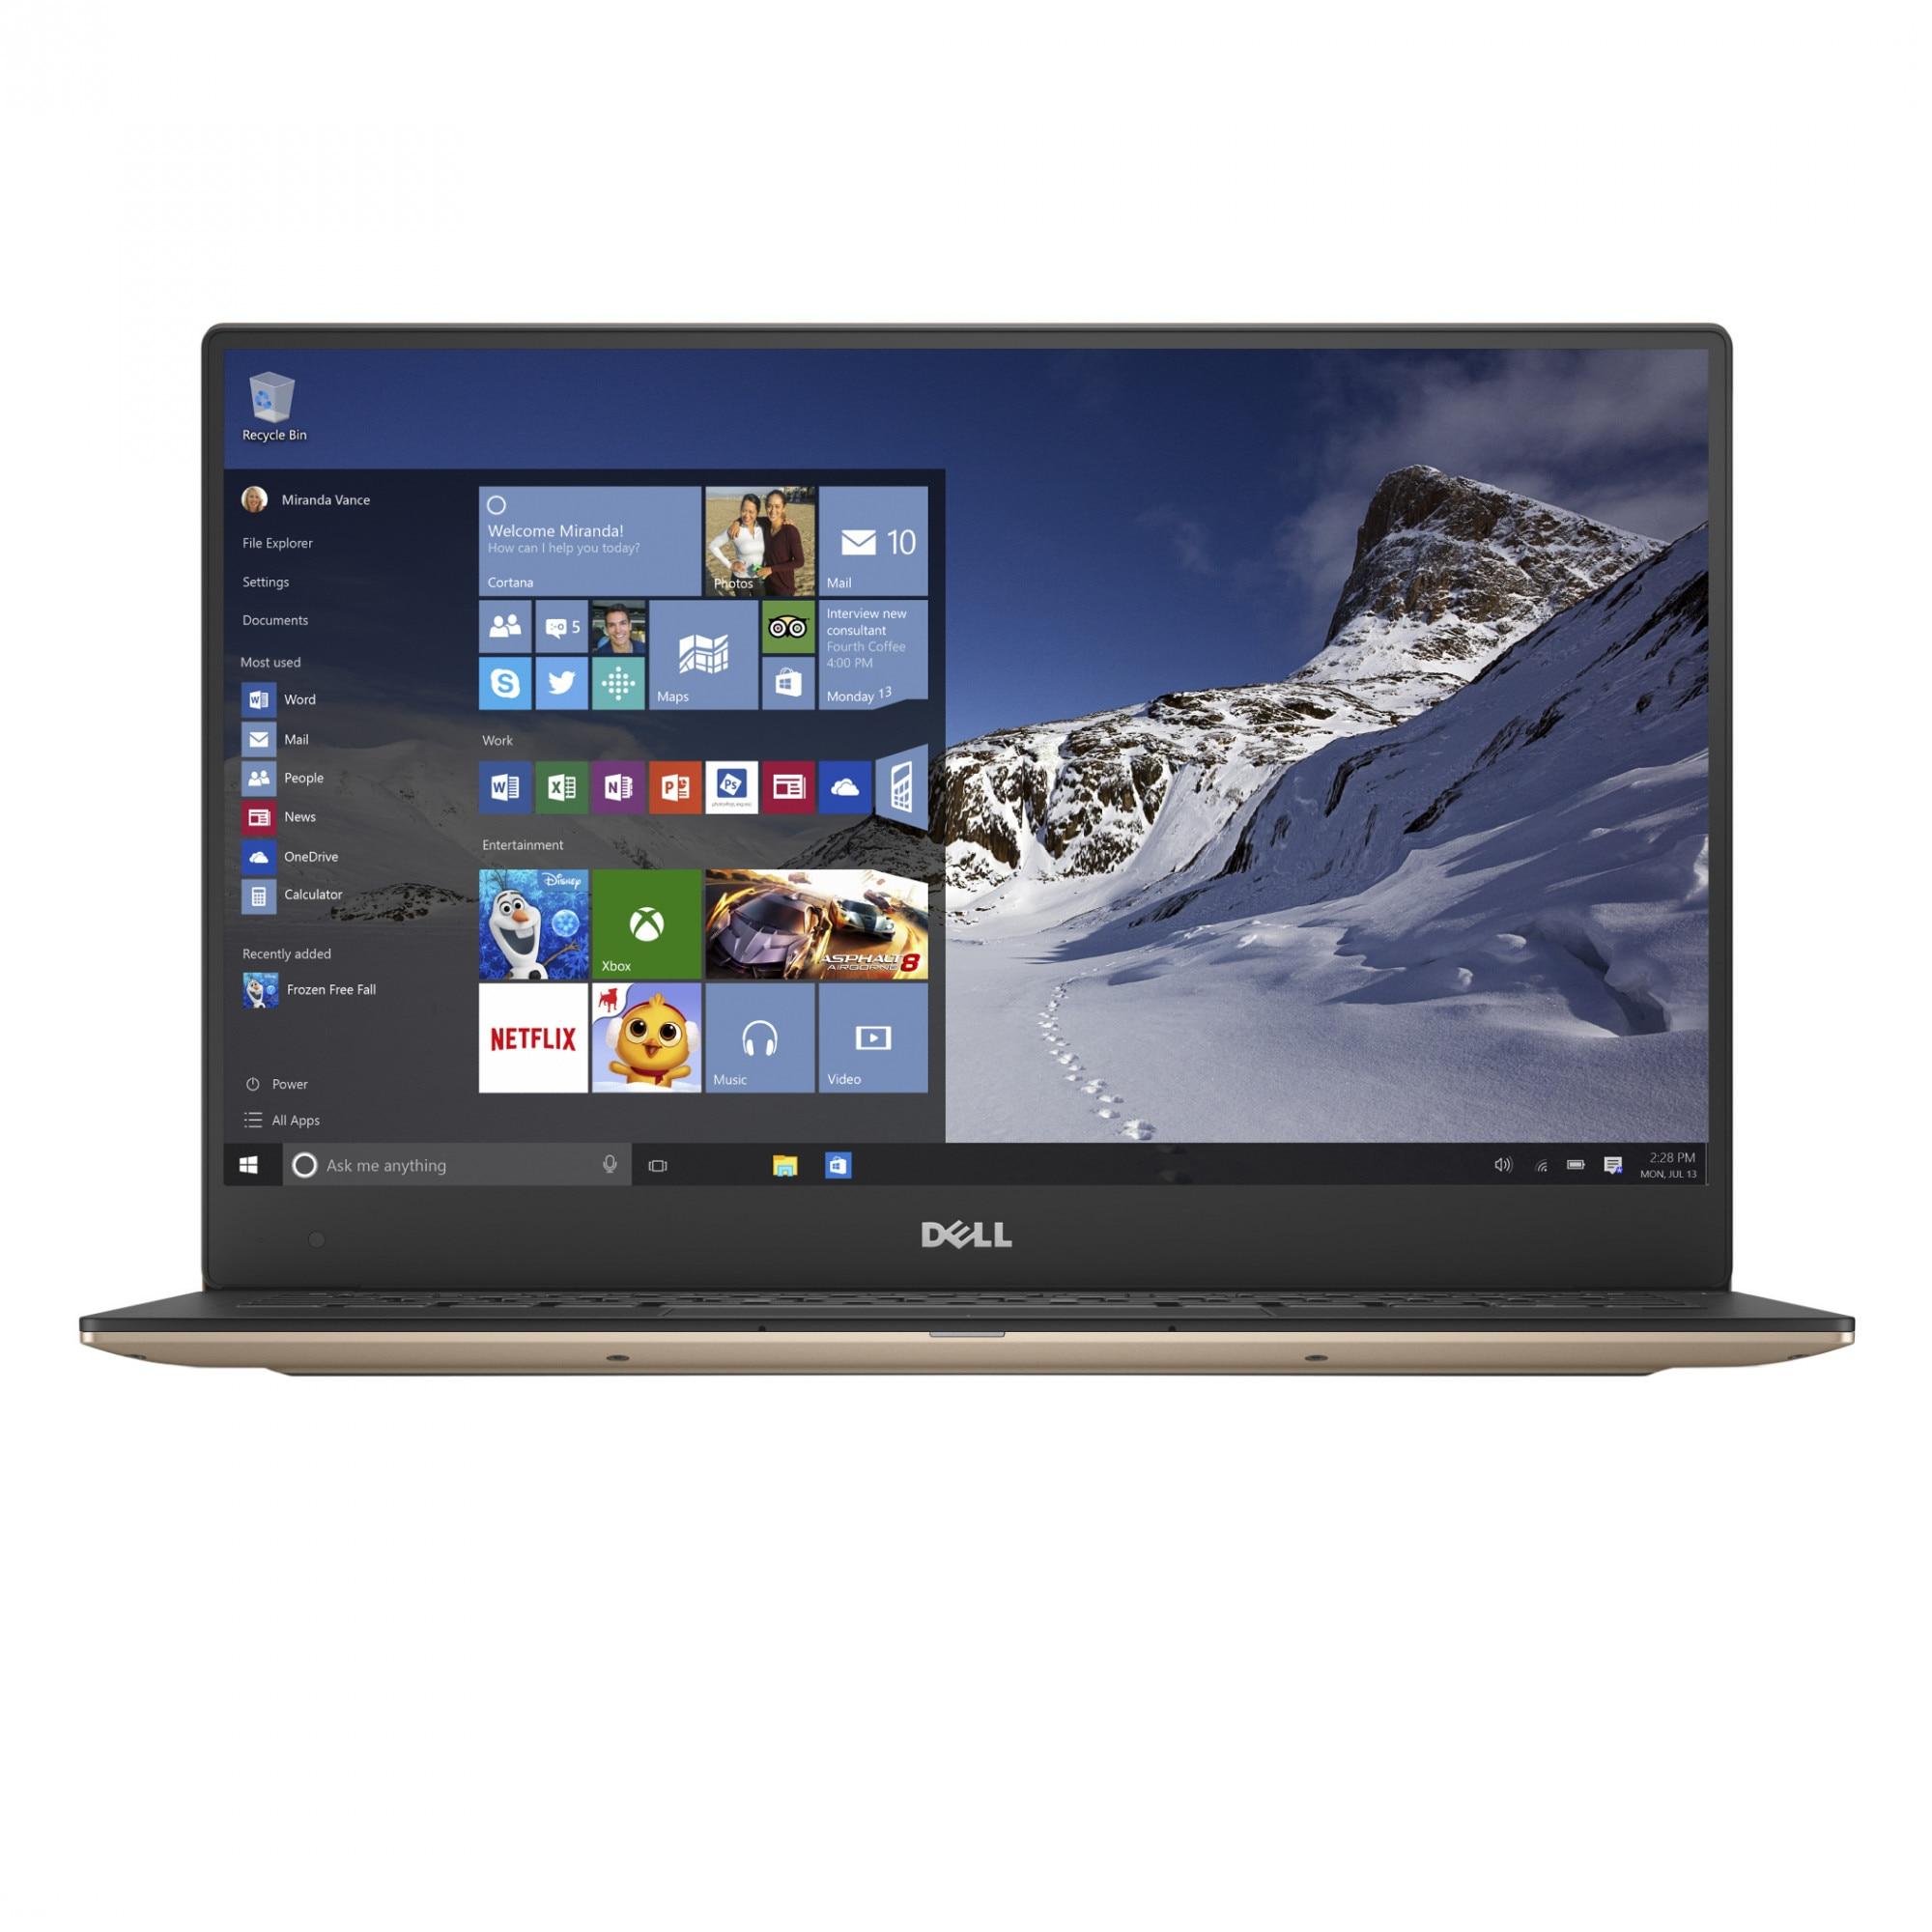 "Fotografie Laptop ultraportabil Dell XPS 13 9360 cu procesor Intel® Core™ i5-7200U pana la 3.10 GHz, 13.3"", Full HD, 8GB, 256GB SSD, Intel® HD Graphics, Microsoft Windows 10, Rose Gold"